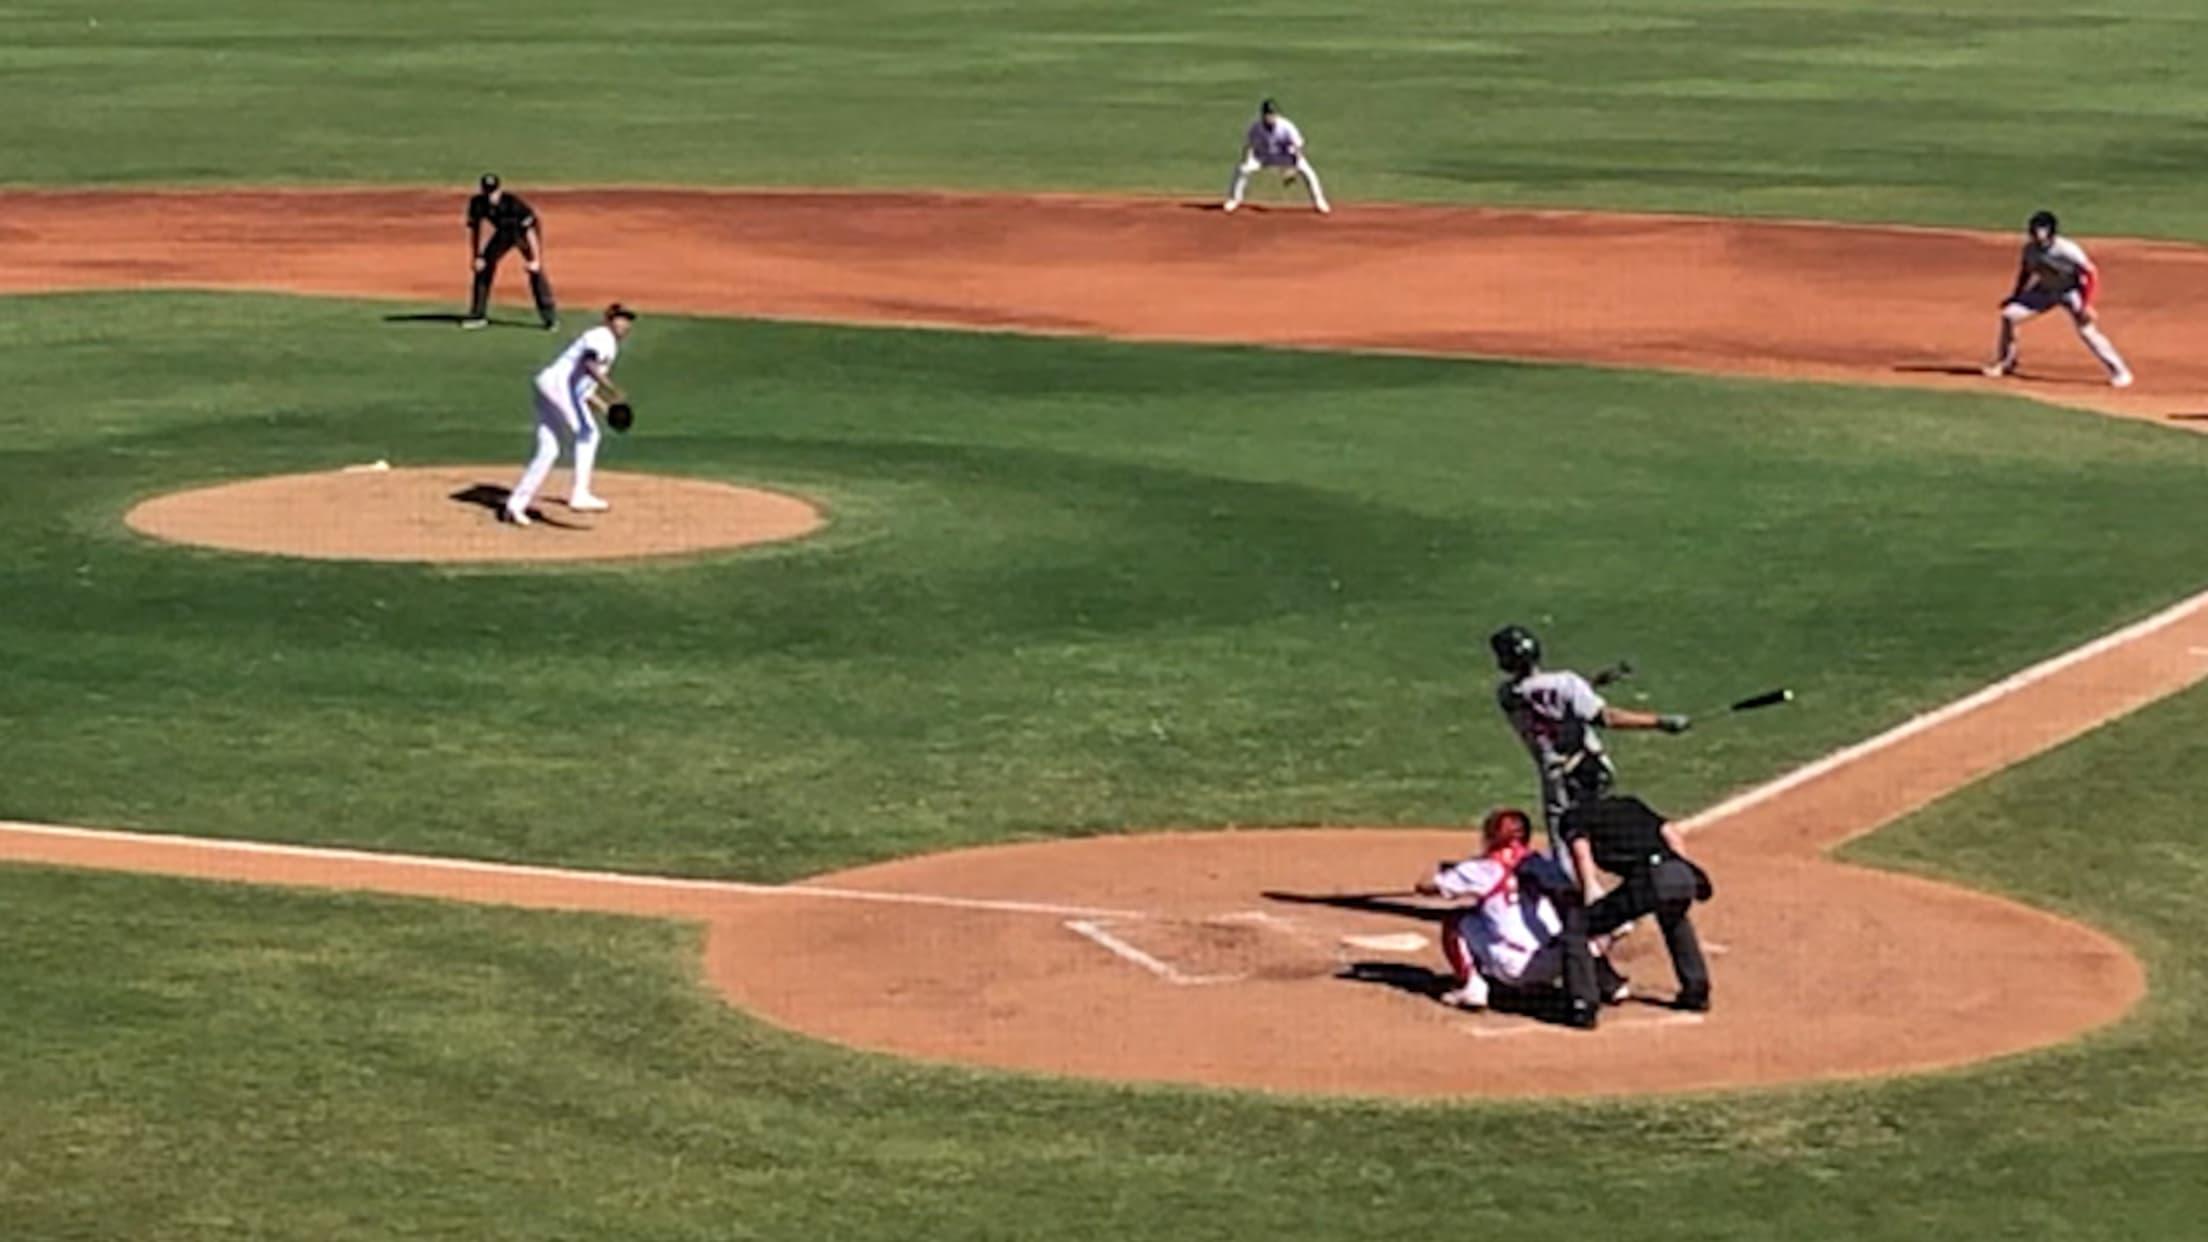 Matt Wallner's two-run home run